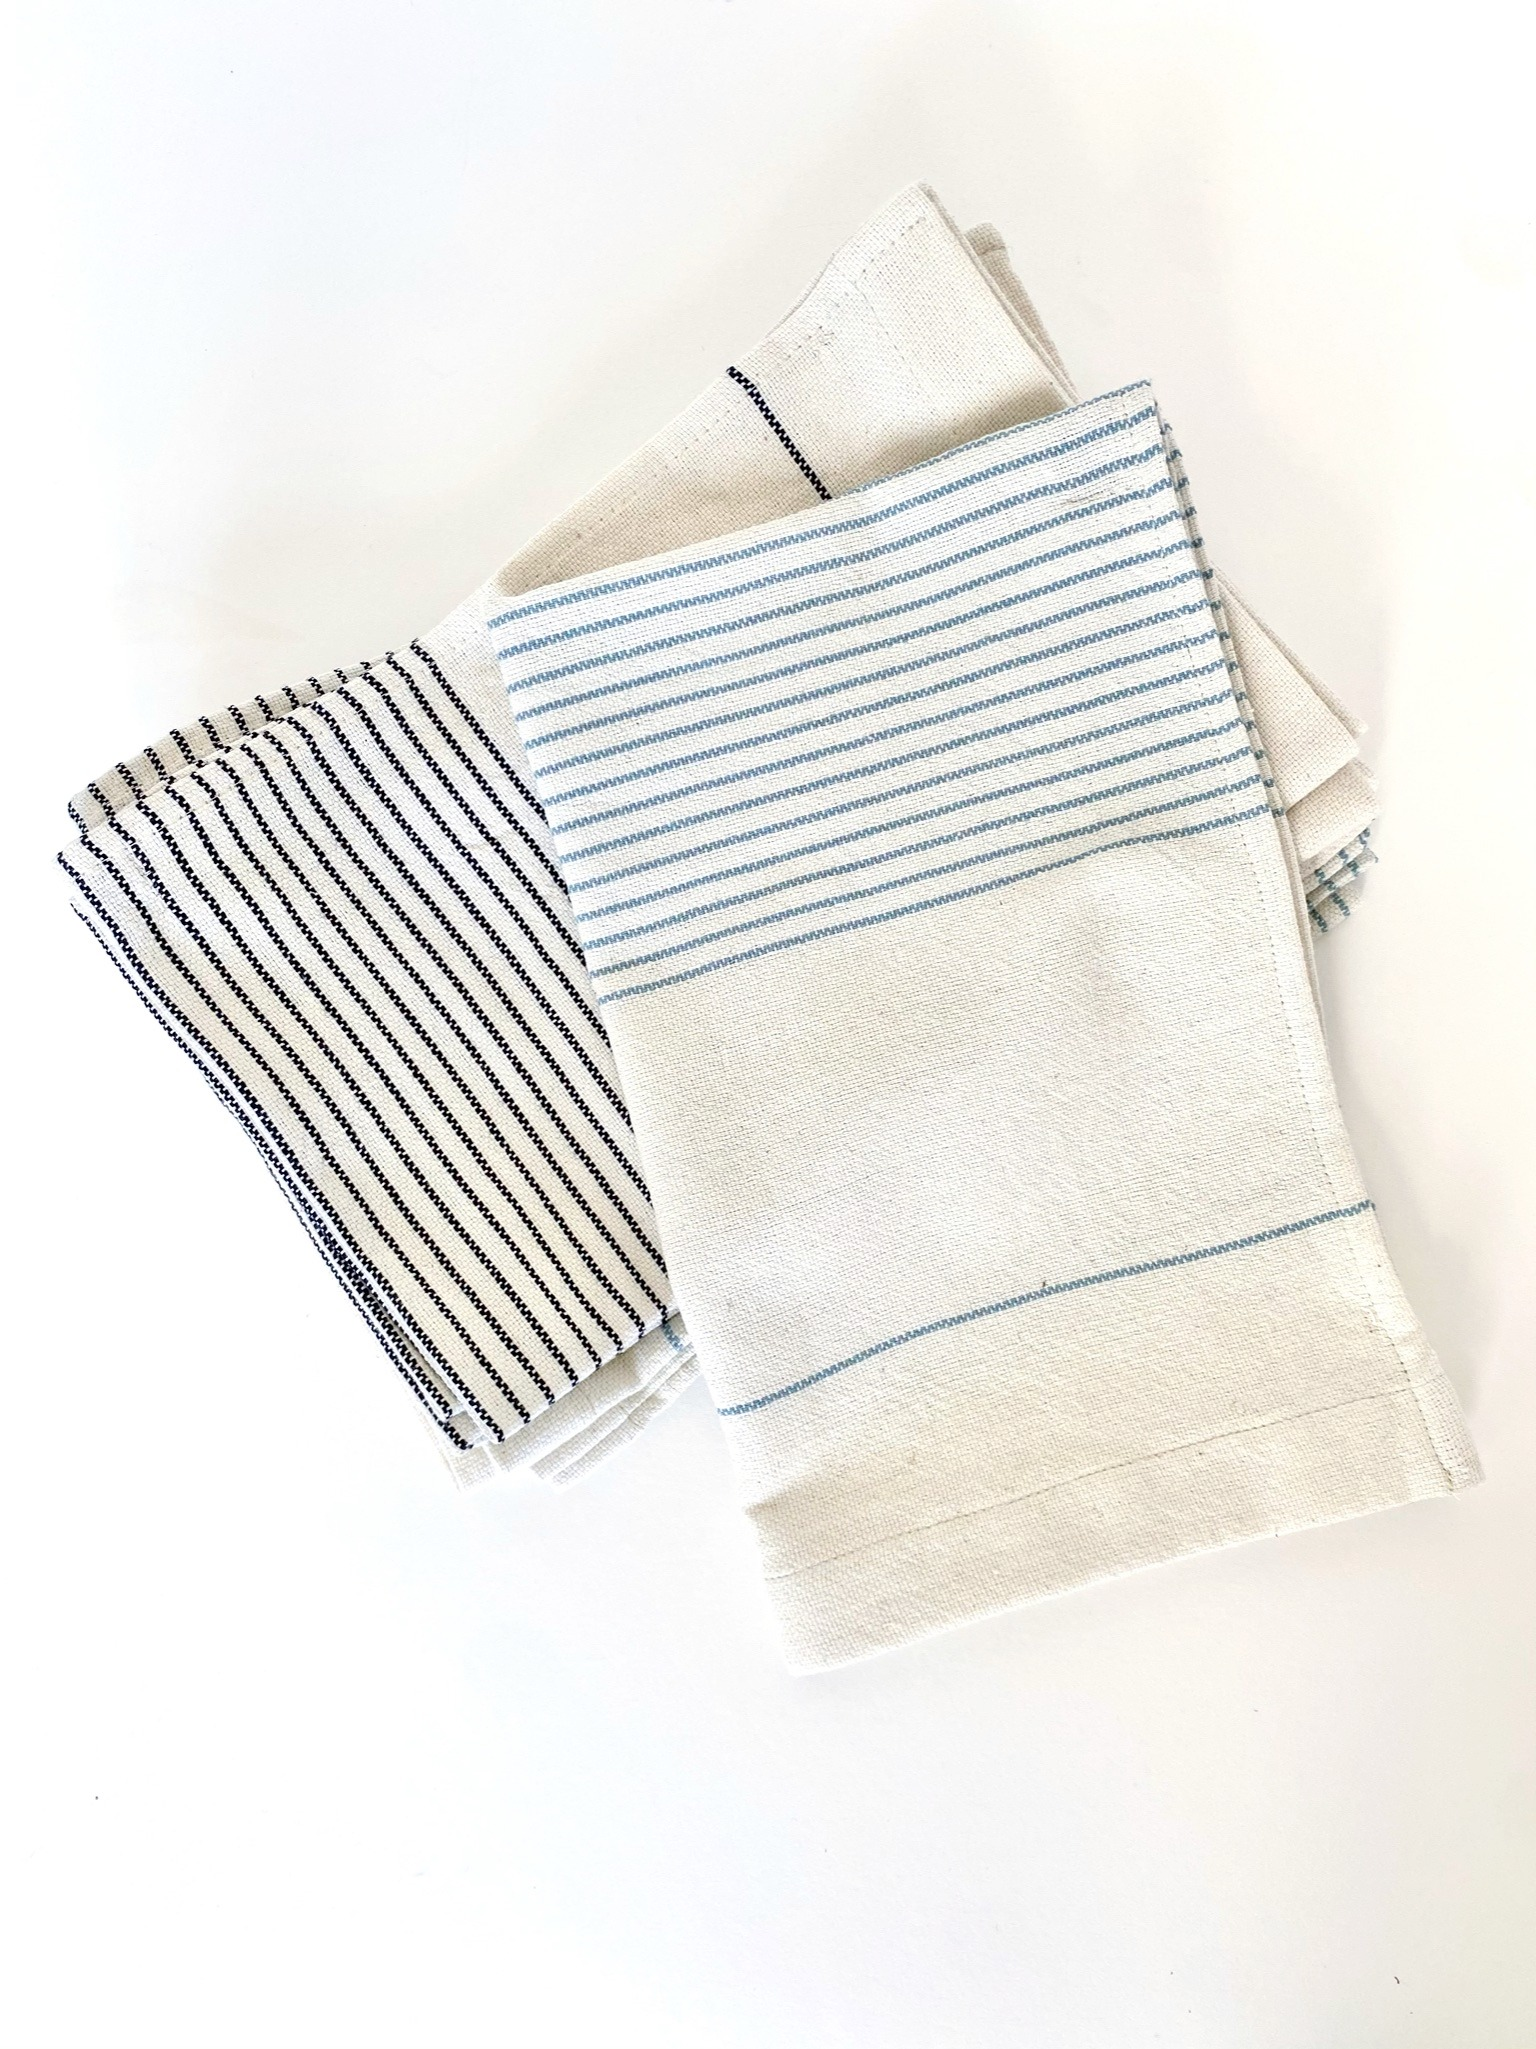 Roha Cotton Tea Towels